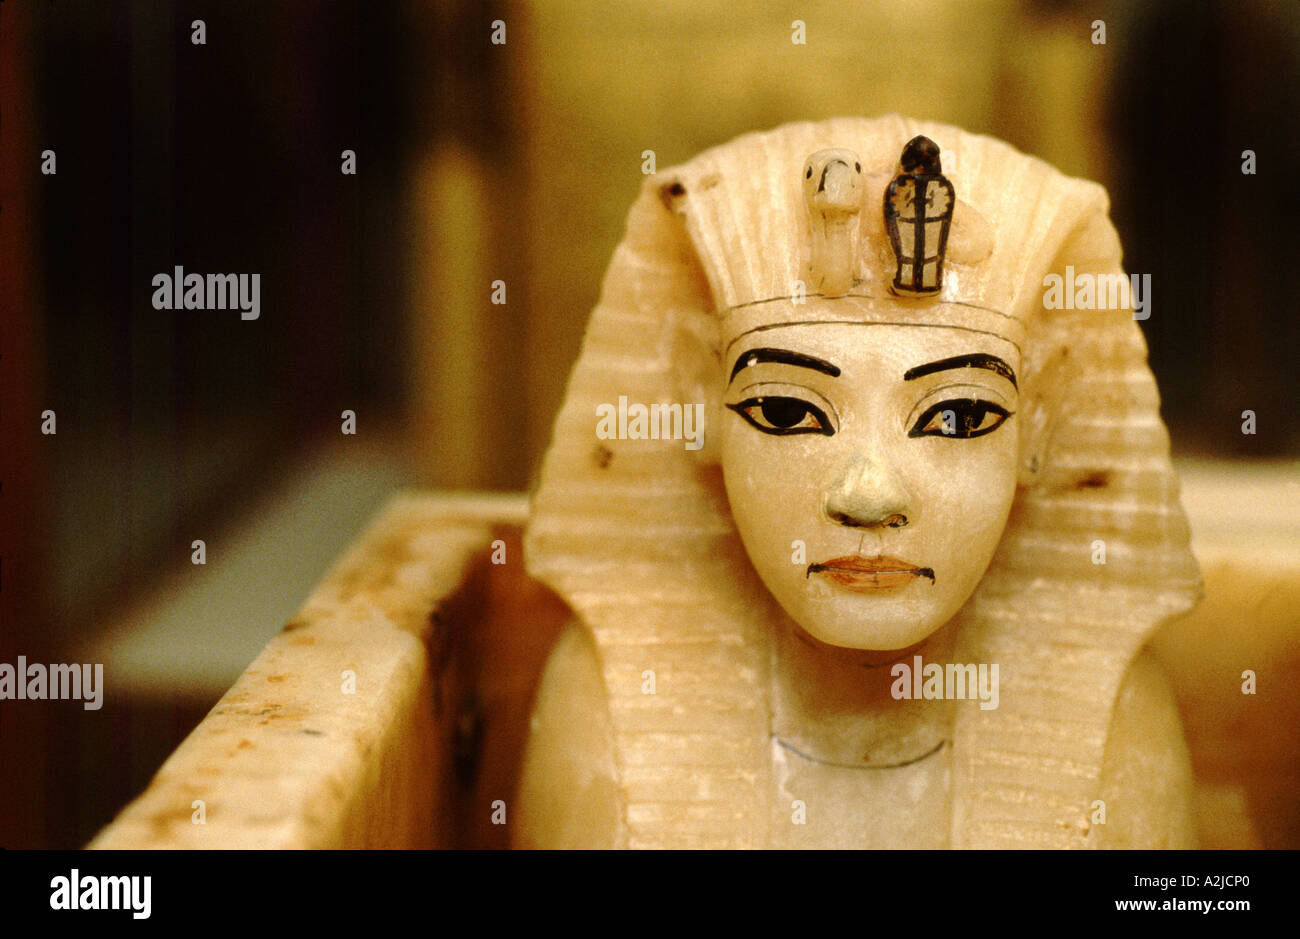 Africa, Egypt, Cairo, Egyptian Antiquities Museum, Tutankhamen collection, Alabaster Tut tops canopic jars - Stock Image